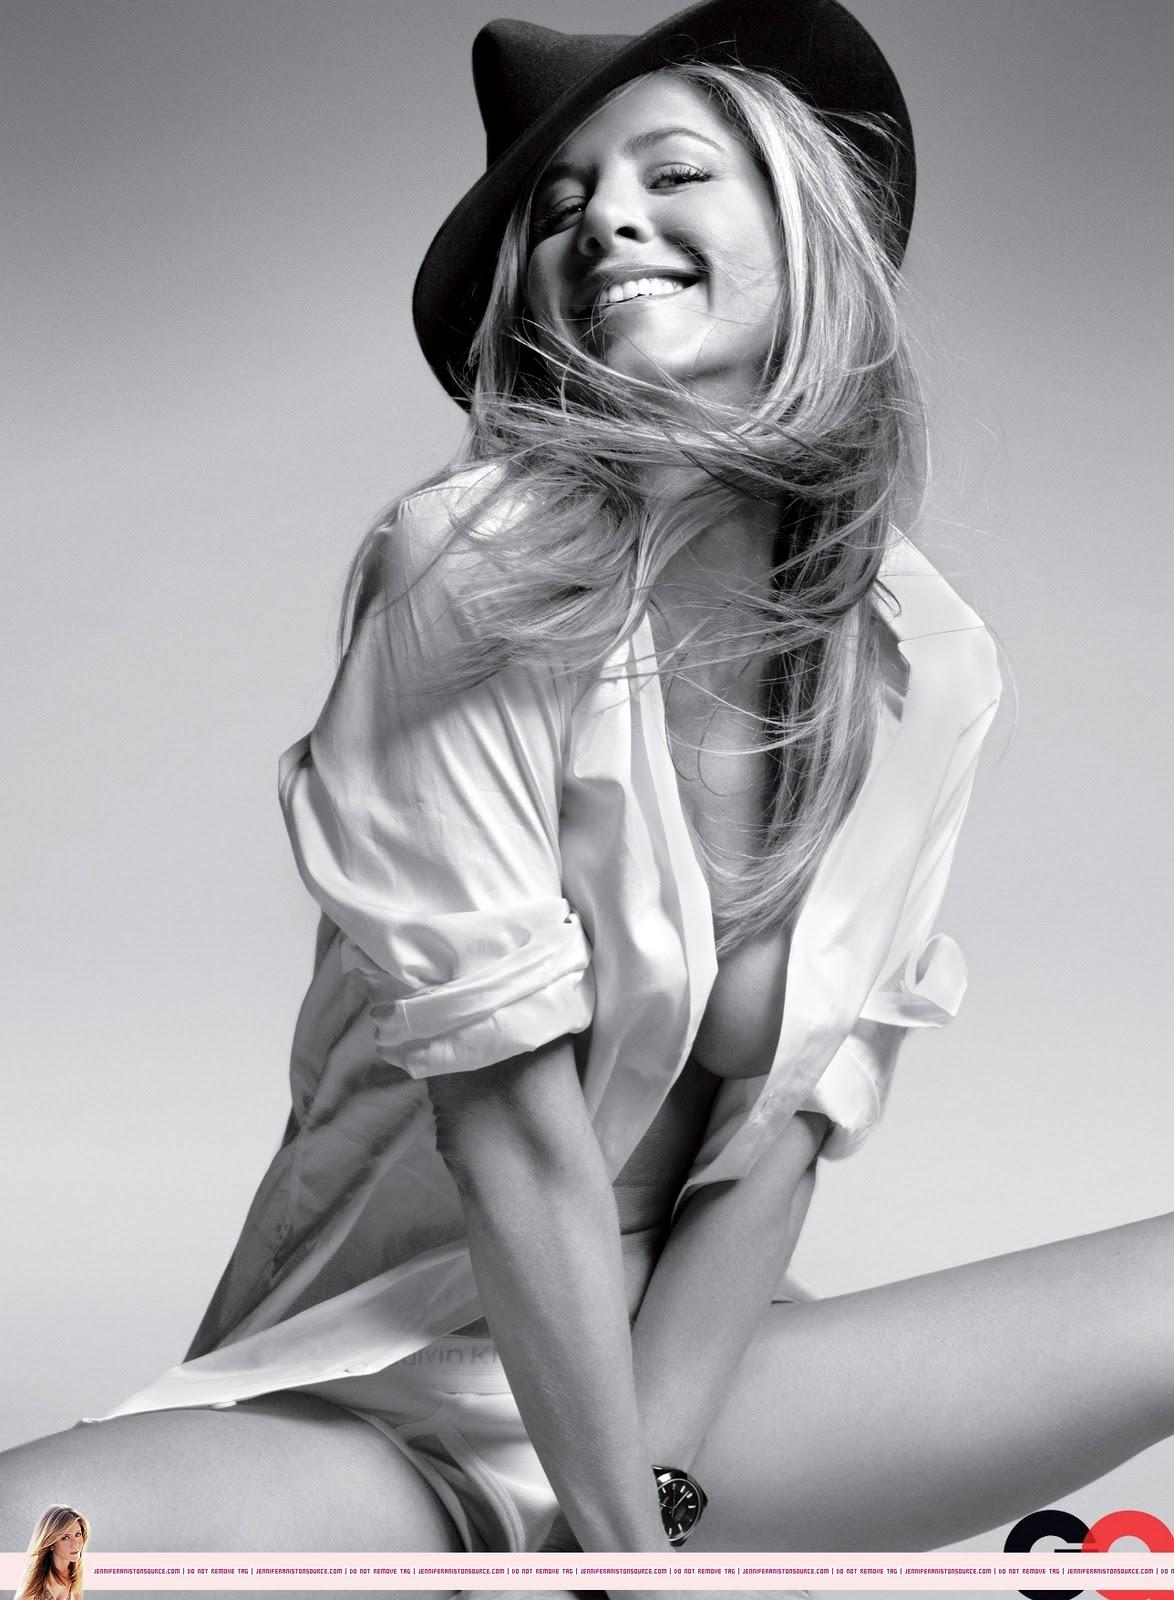 http://1.bp.blogspot.com/-5Y6ZcFrbUSk/TnVTrjWXgfI/AAAAAAAAHtg/cCKIlqcca3U/s1600/Aniston+topless+para+revista+GQ.jpg